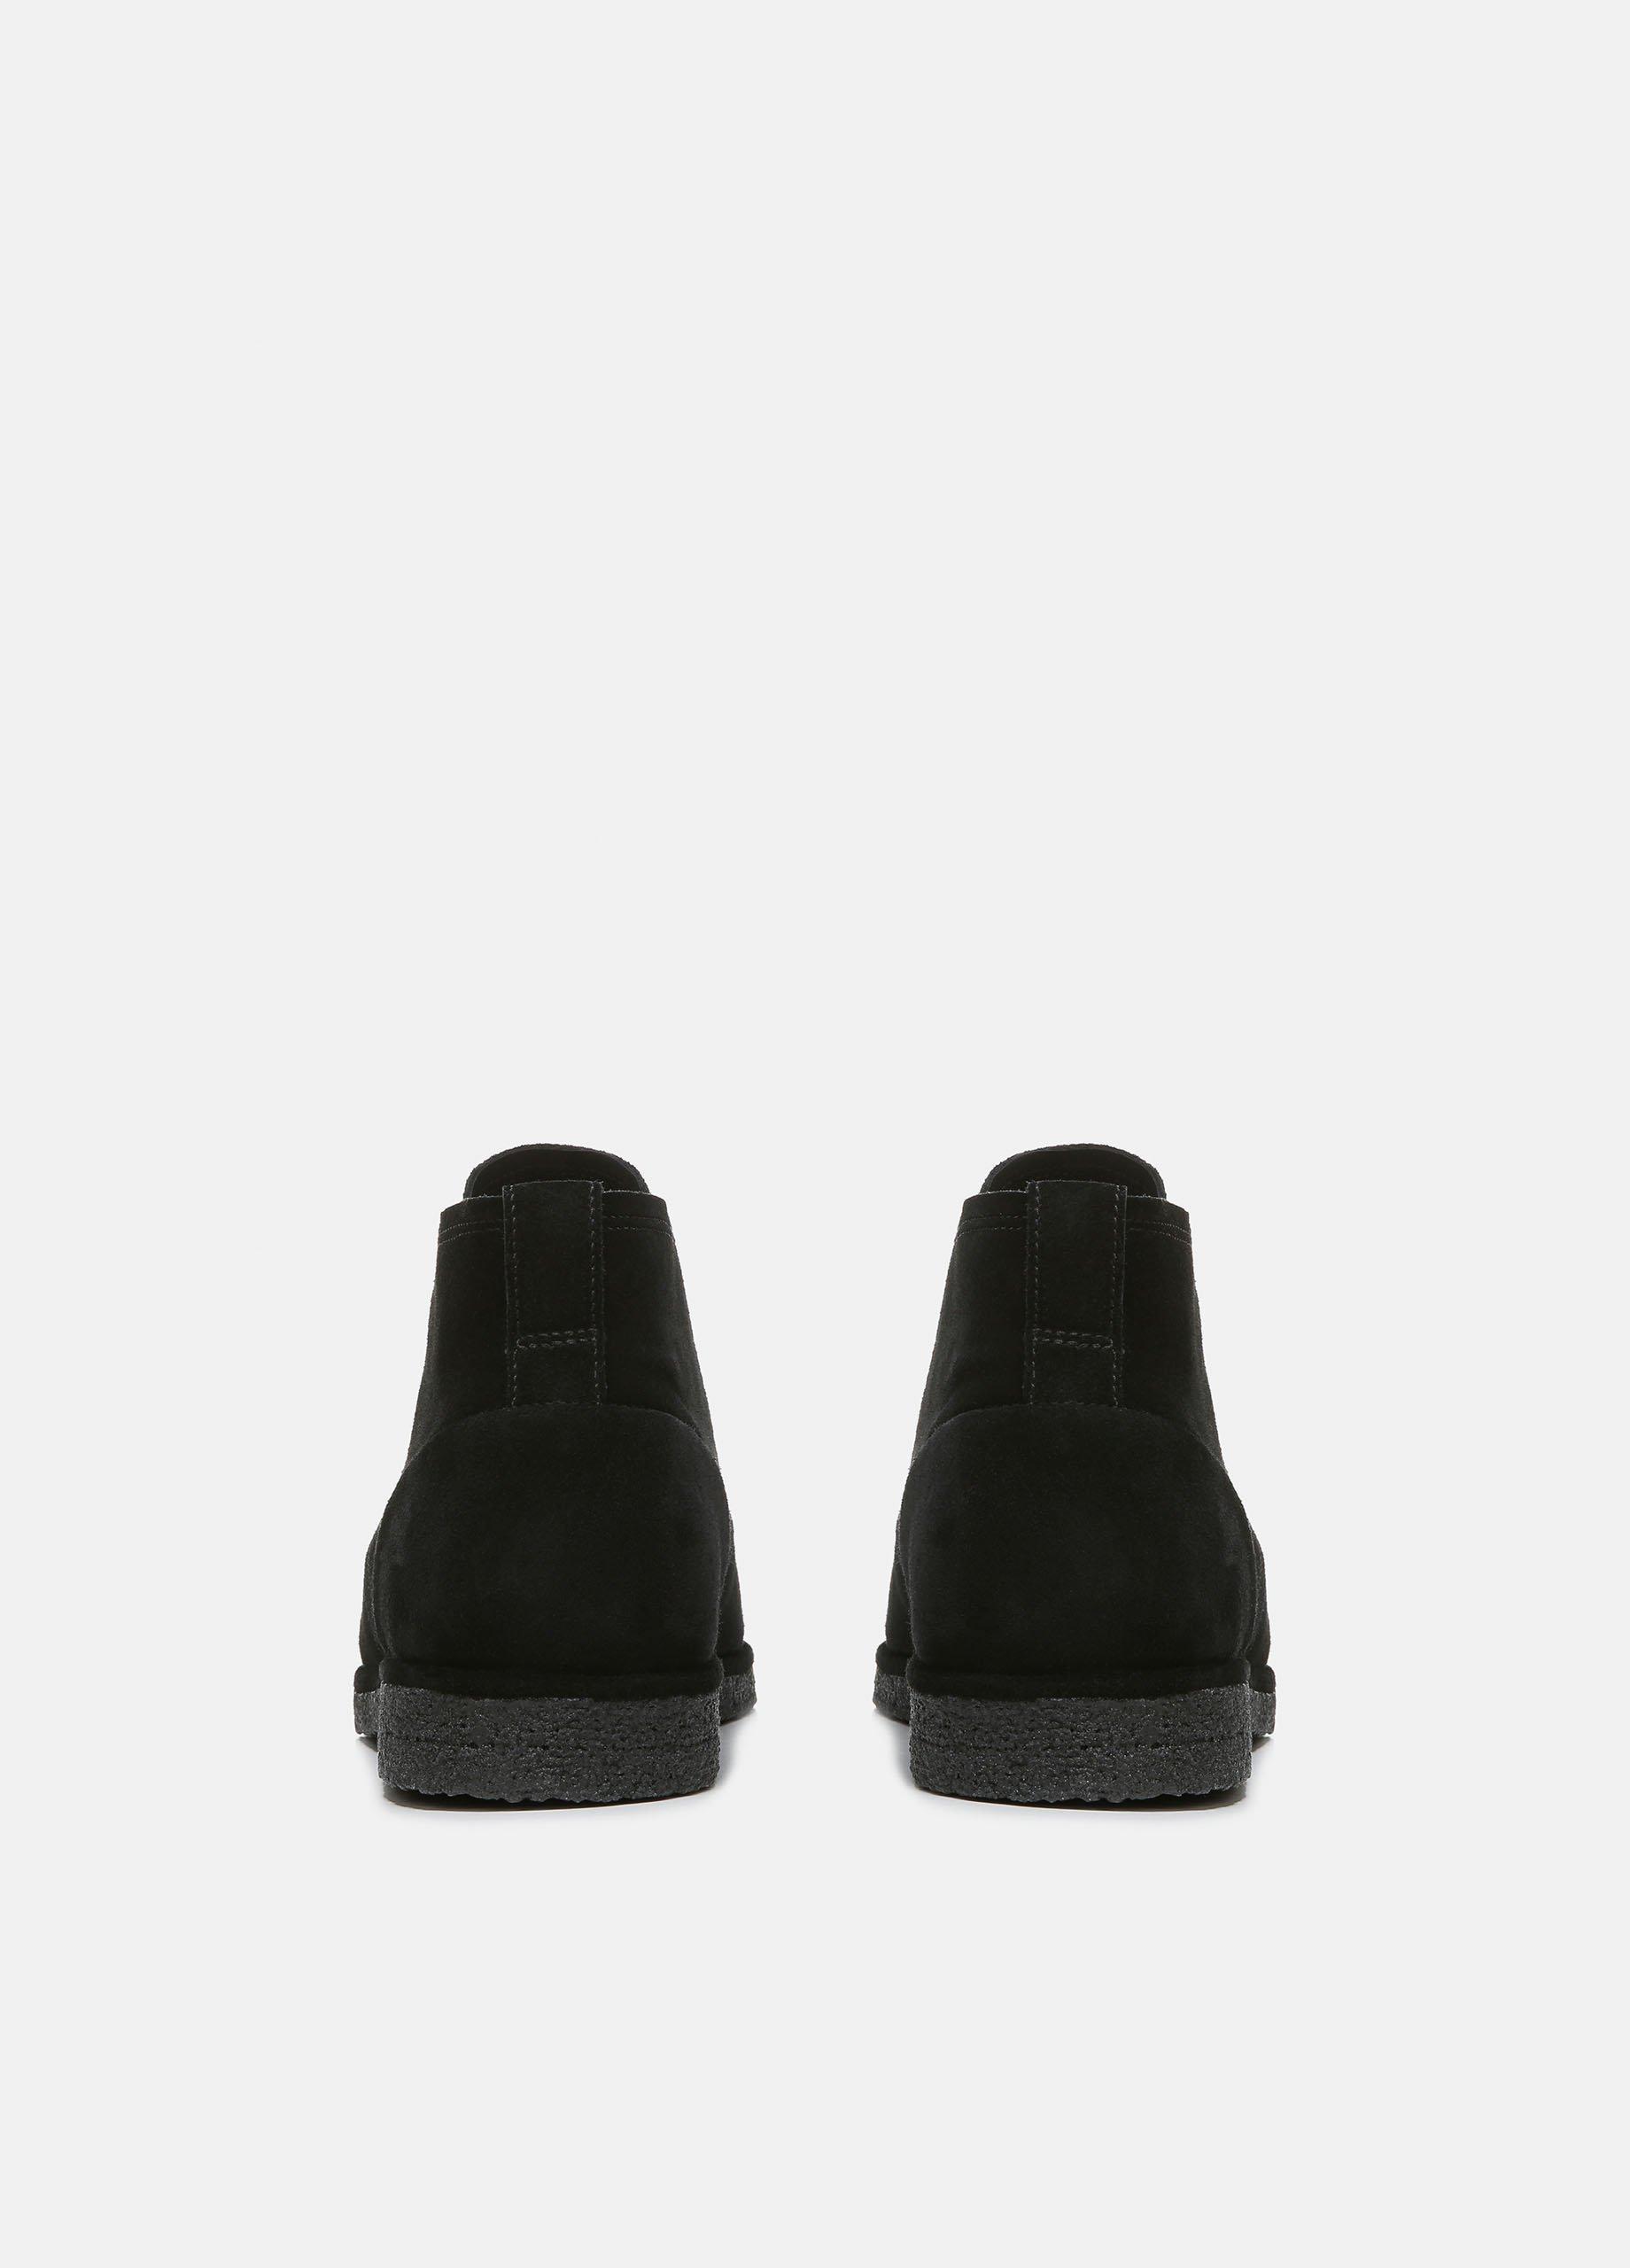 Benson Boot